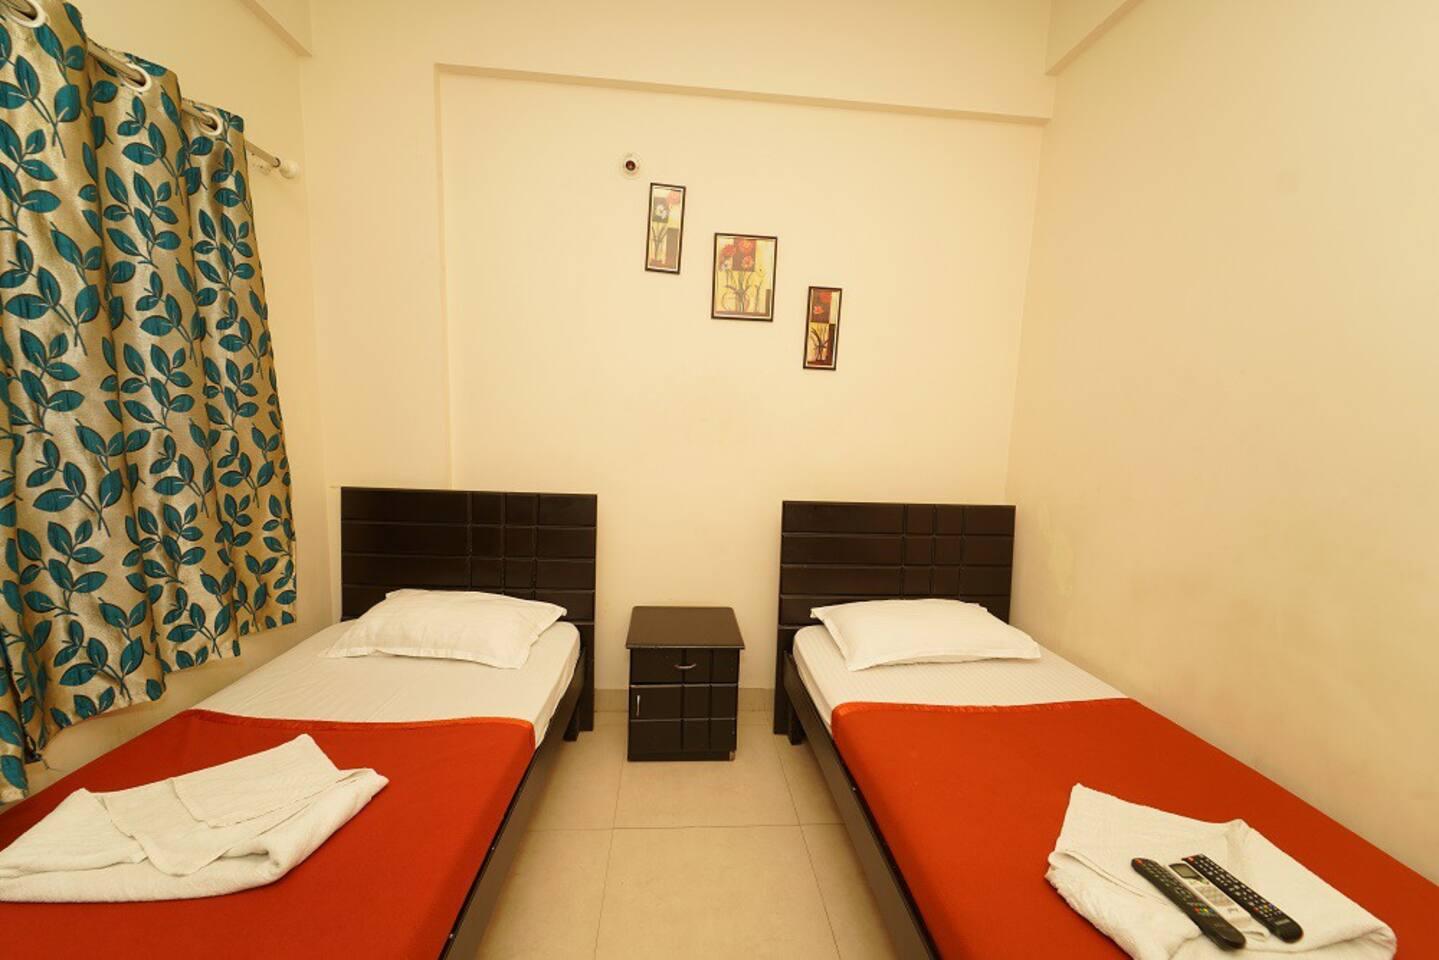 Bedroom-Single bed